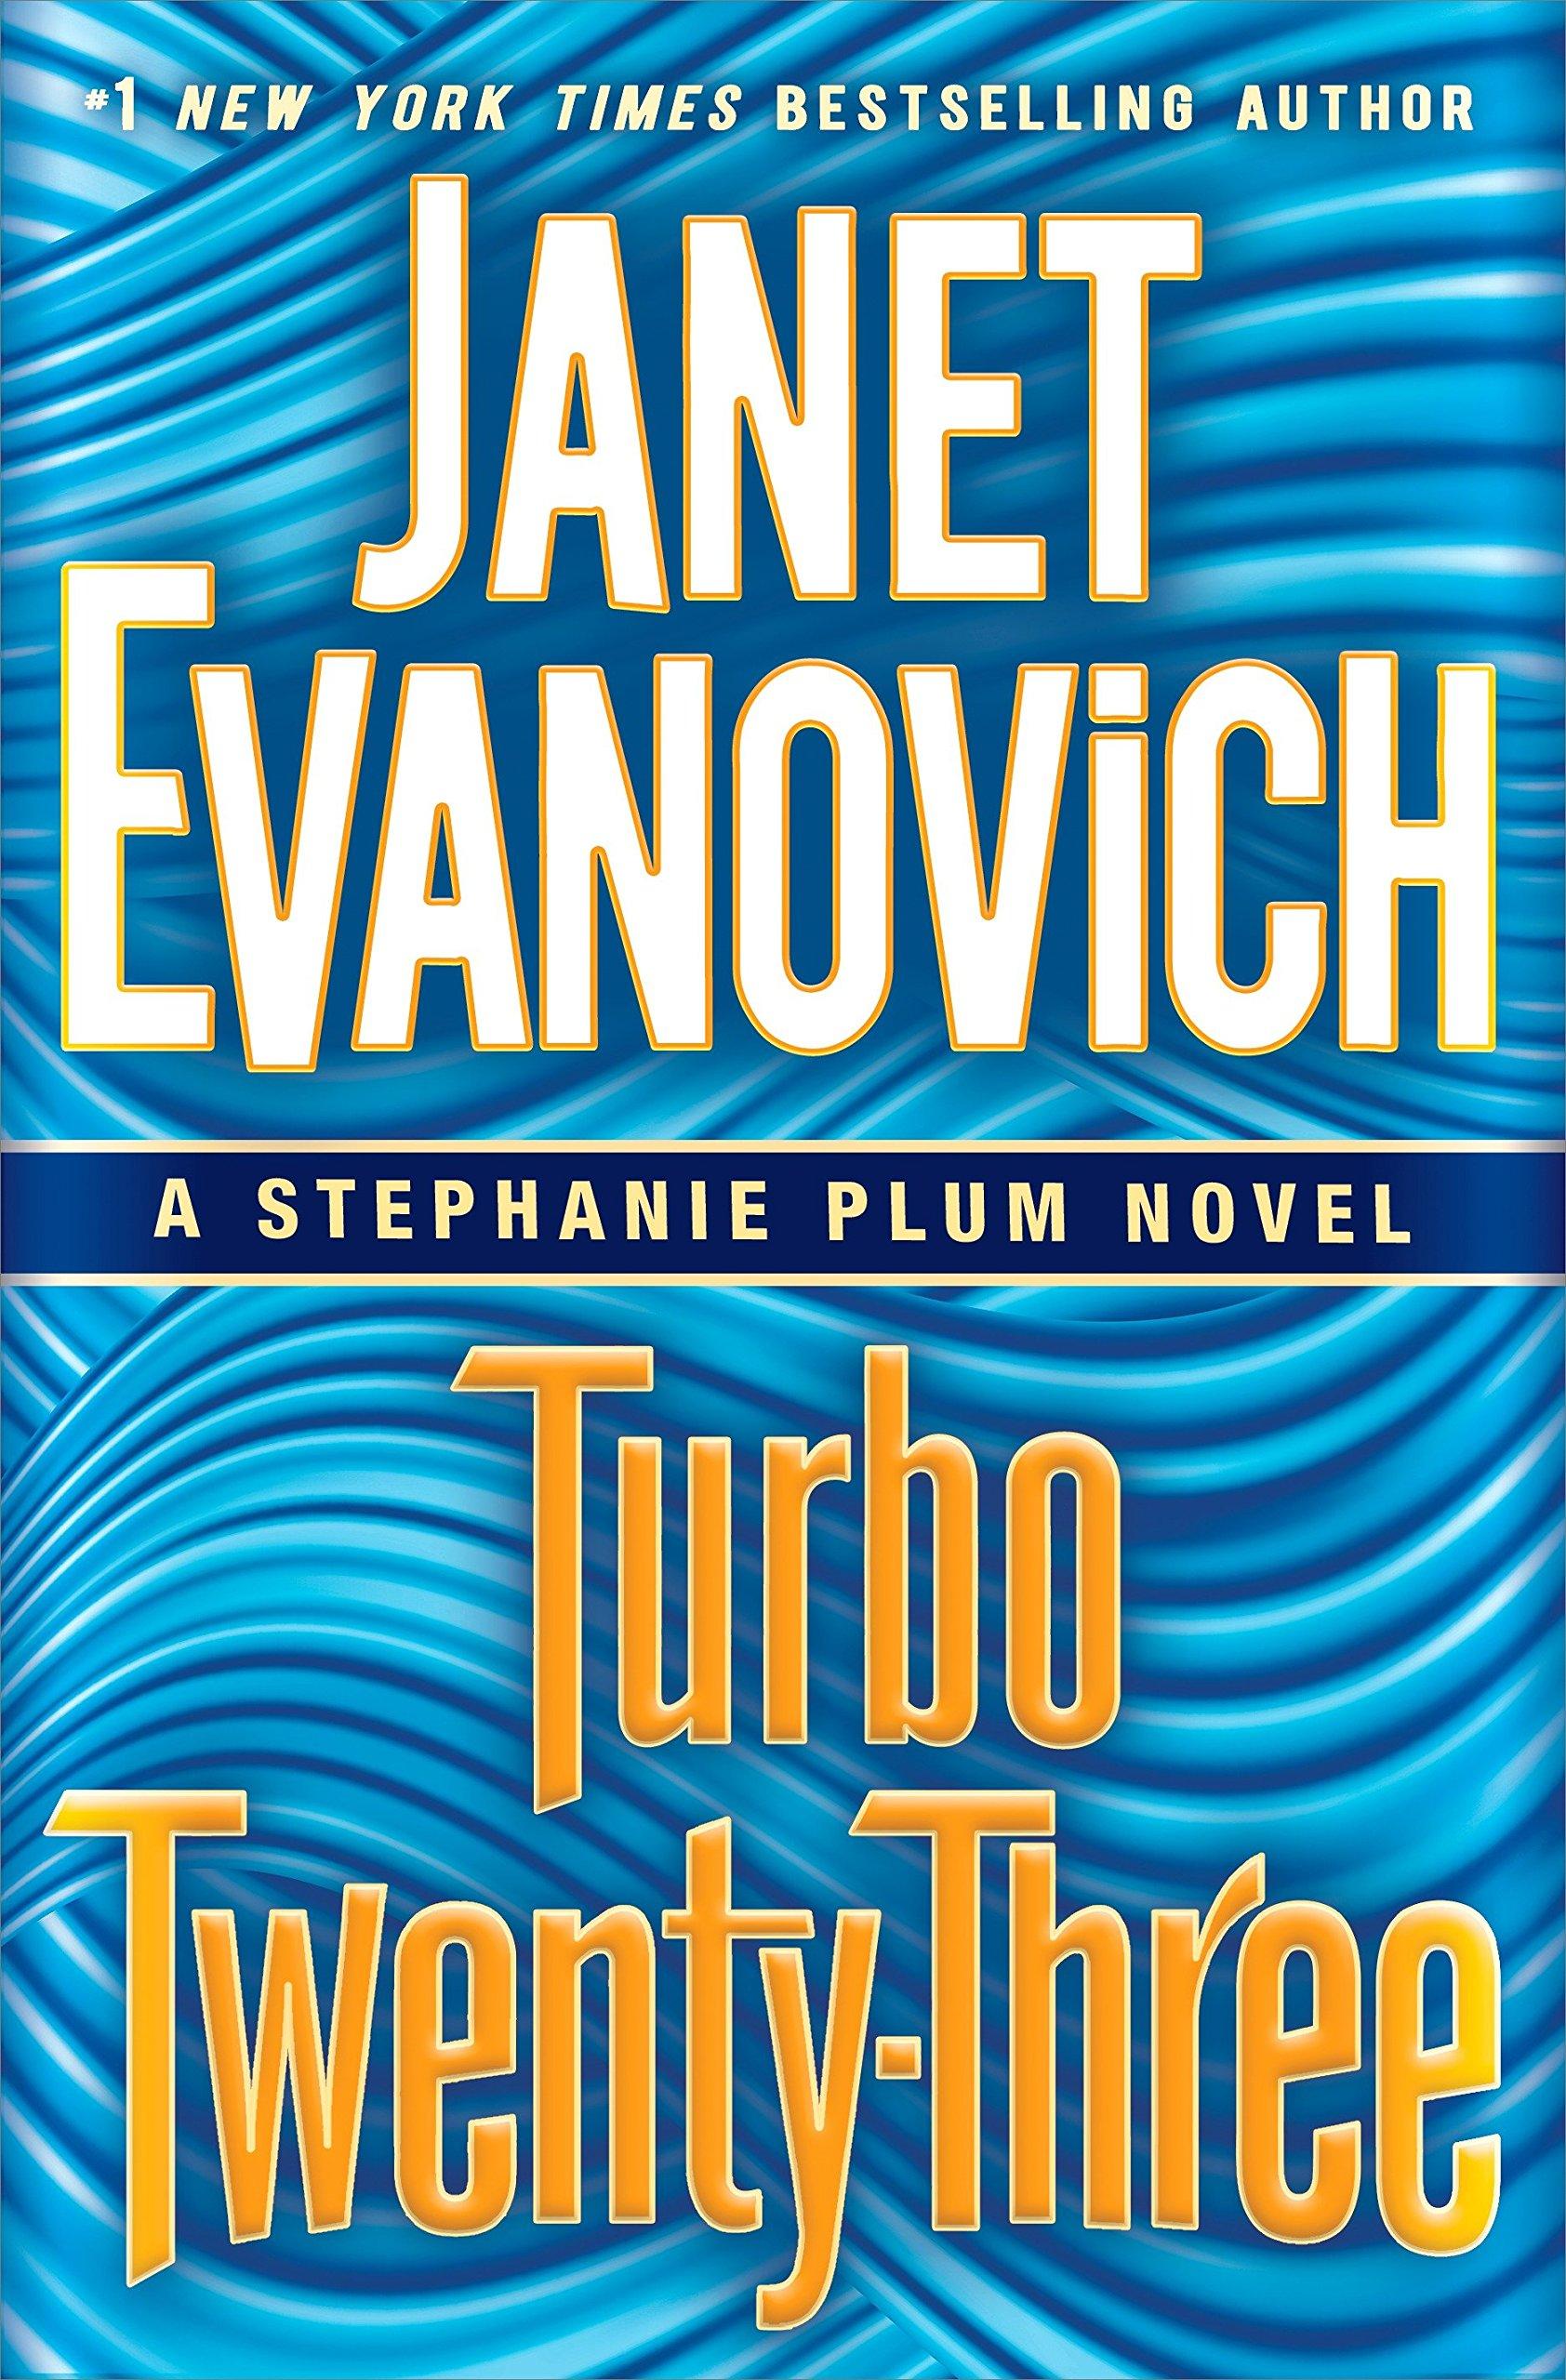 Turbo Twenty Three A Stephanie Plum Novel Janet Evanovich 9780345543004 Amazon Books